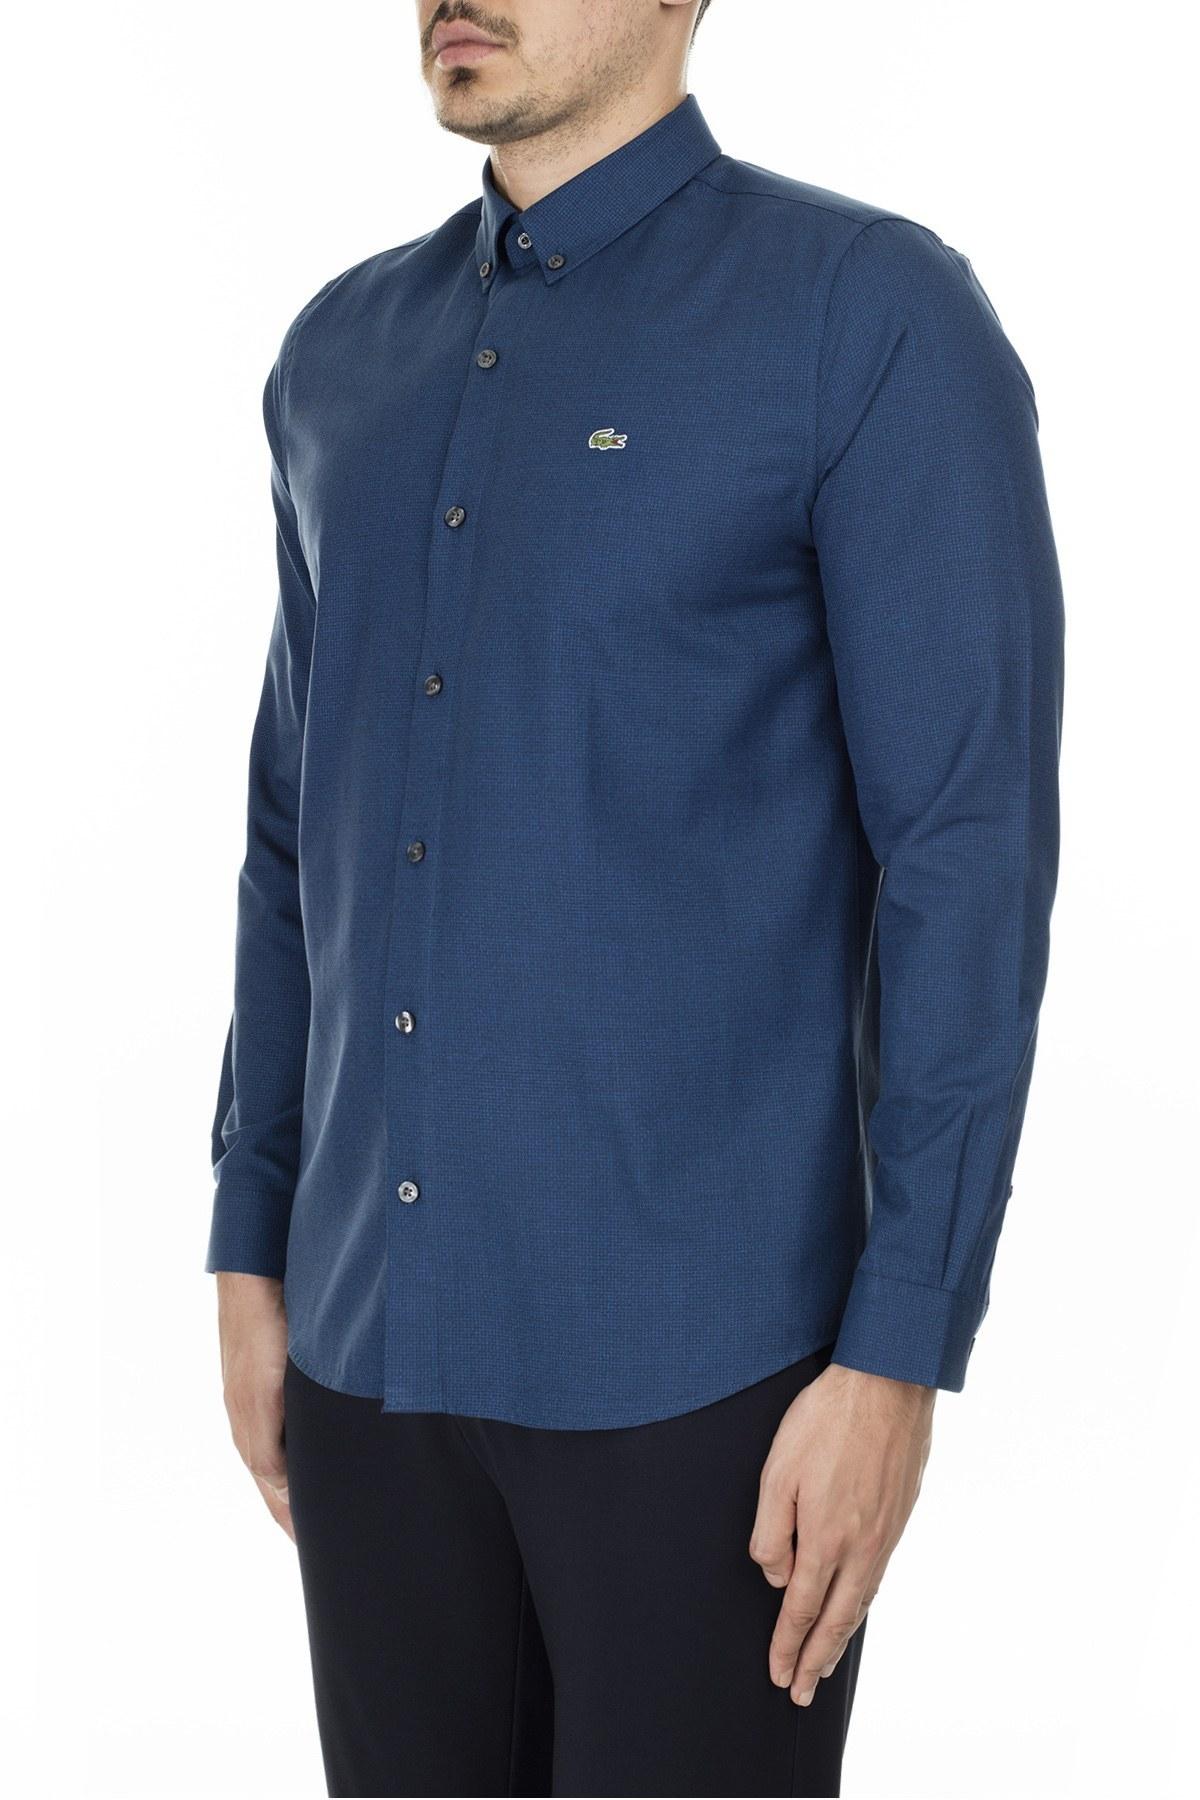 Lacoste Düğmeli Yaka Pamuklu Slim Fit Erkek Gömlek CH2138 38L MAVİ